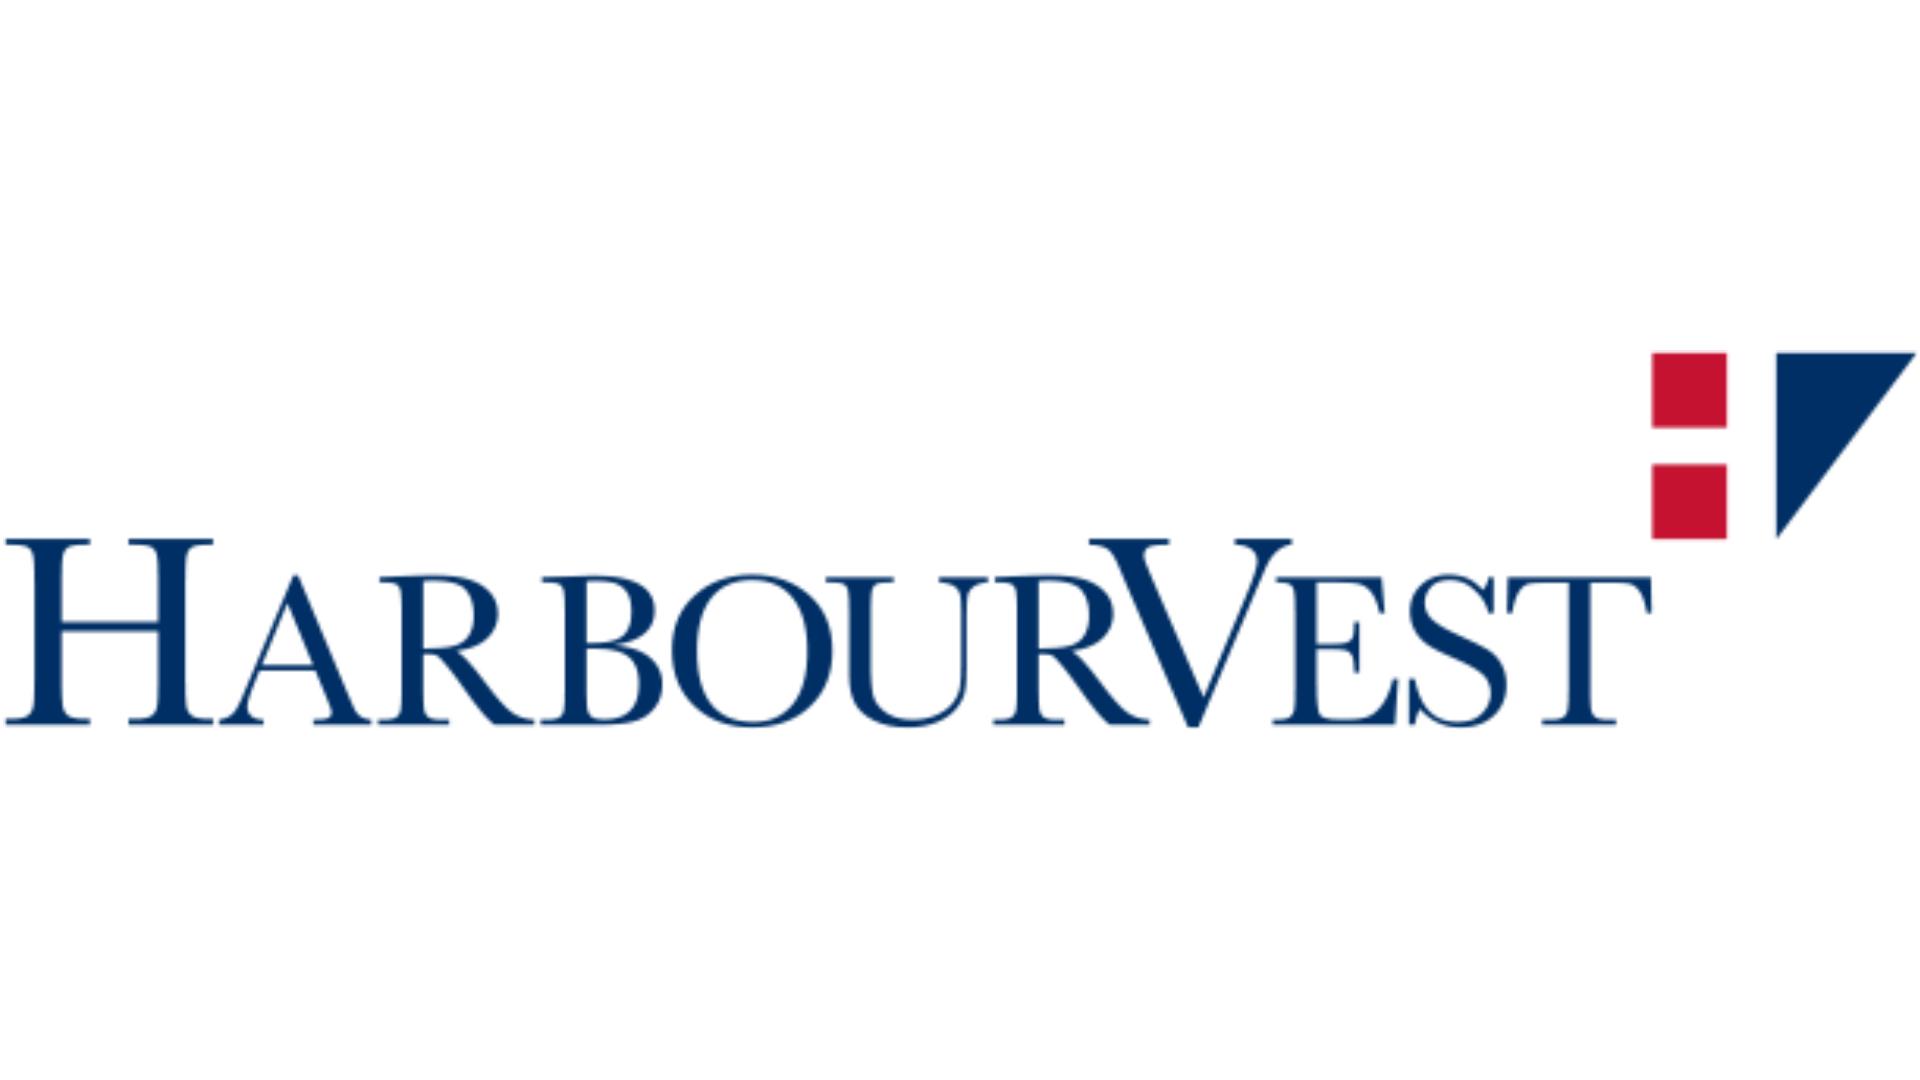 HarbourVest